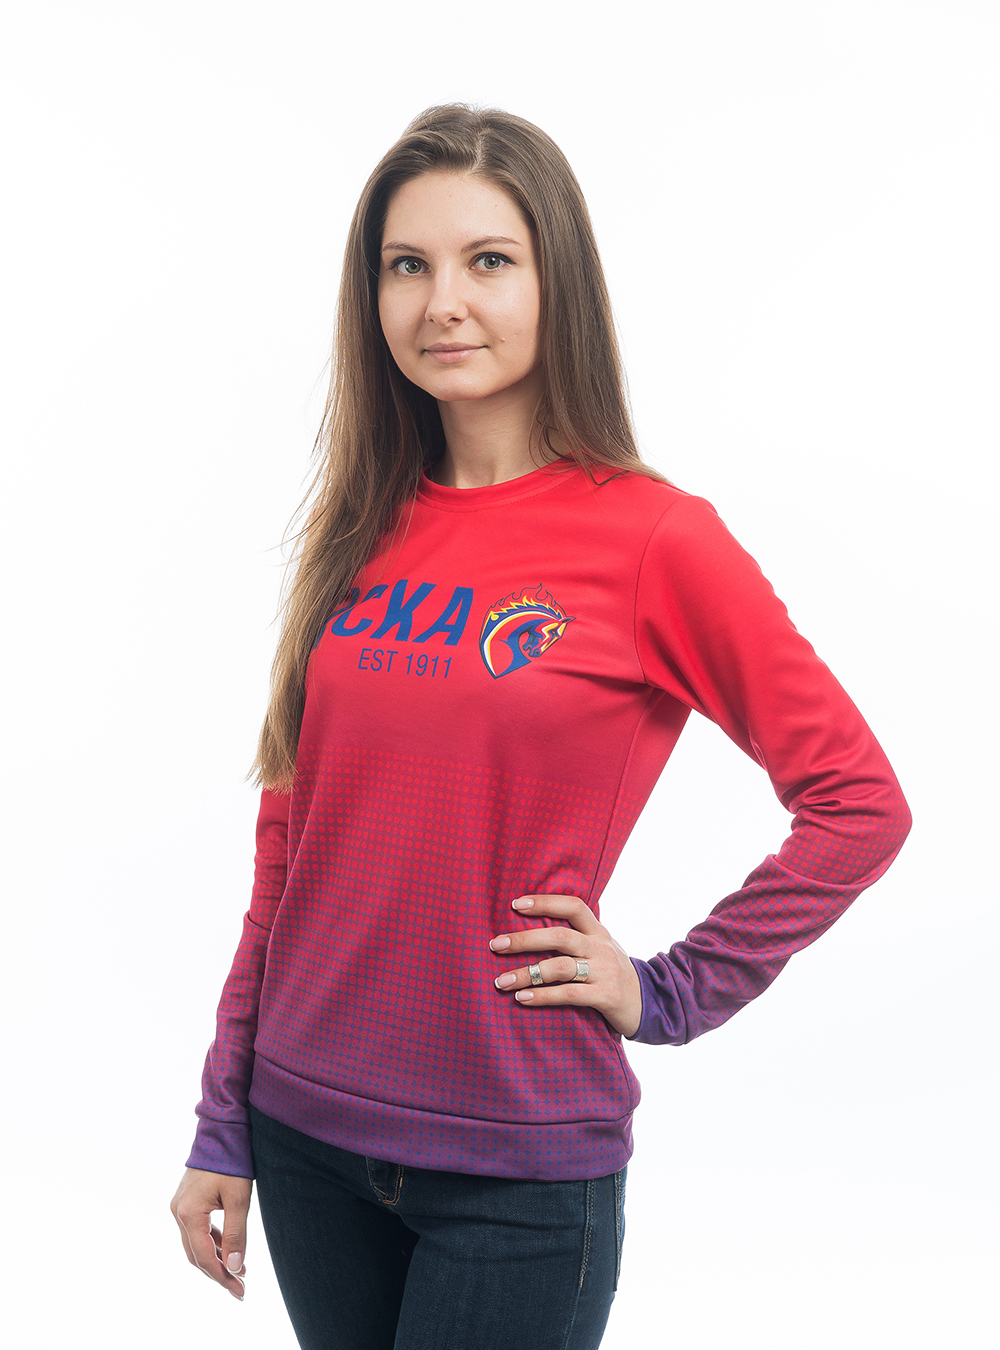 Свитшот женский Талисман Градиент (S)Одежда на заказ<br>Свитшот женский Талисман ГрадиентC:\Users\eugene\Desktop\Фото<br>